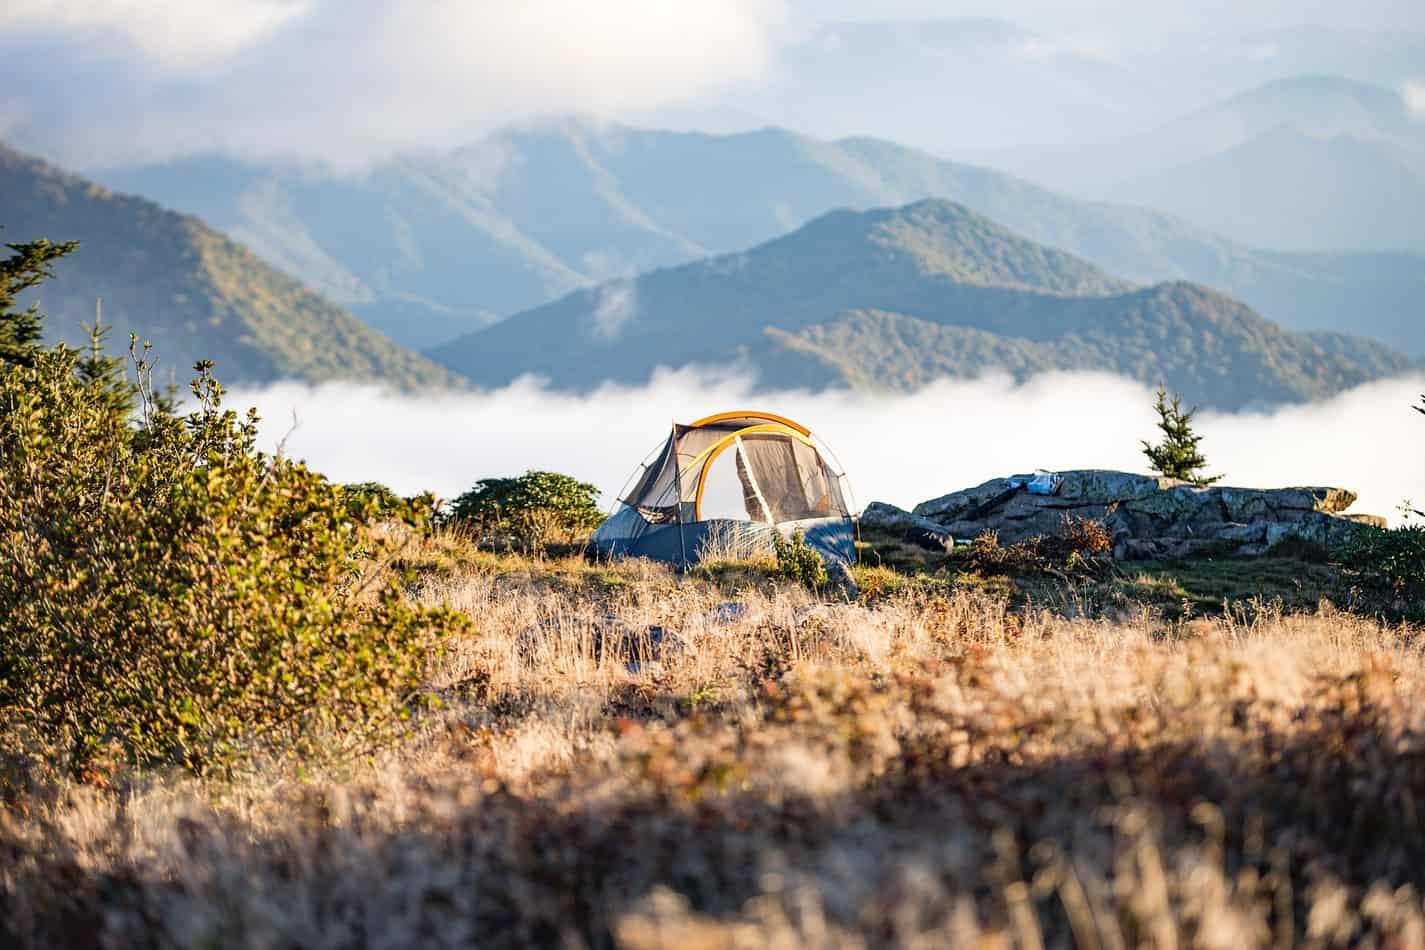 choosing a good campsite